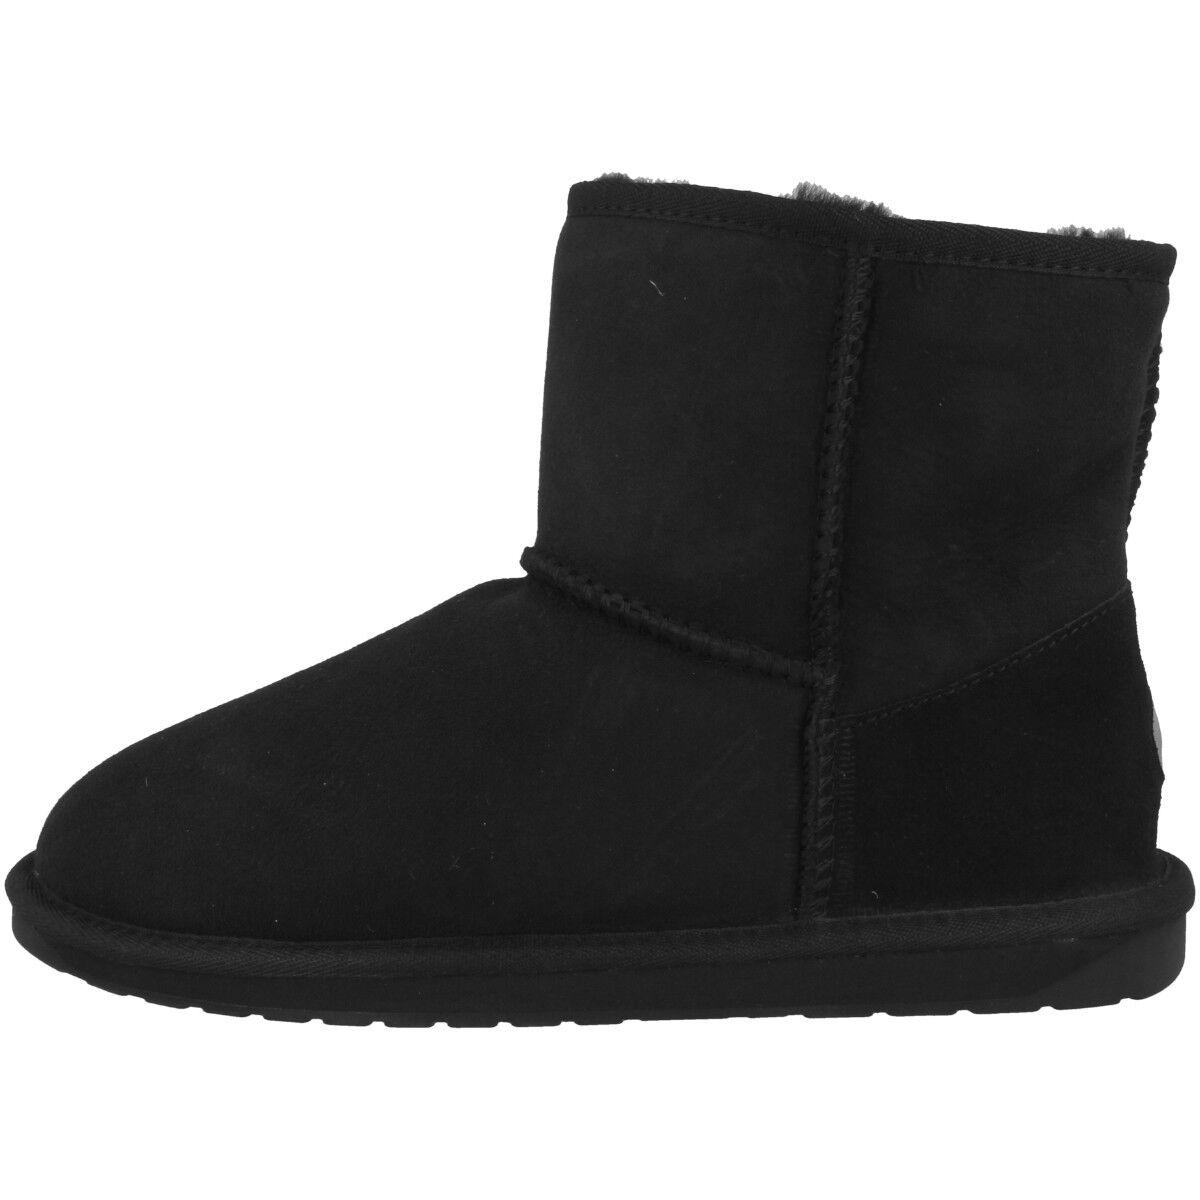 EMU Australia Stinger Mini damen Damen Schuhe Stiefel Stiefel schwarz W10003-E003